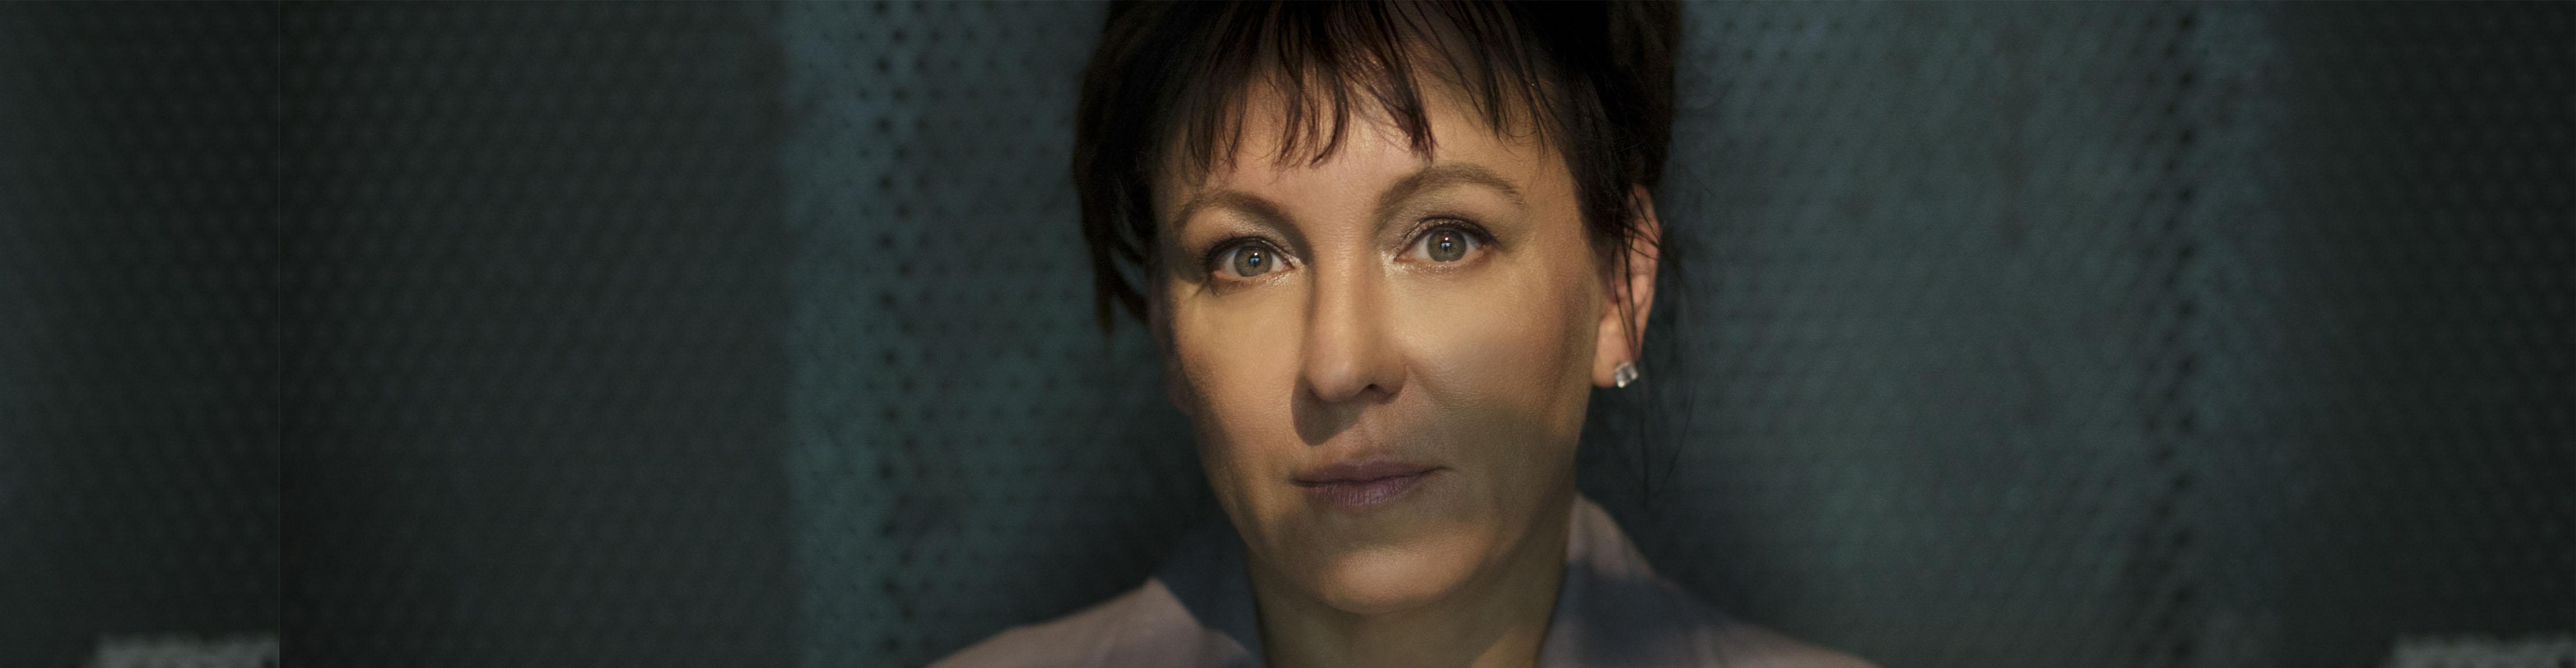 Booker-priset till Olga Tokarczuk